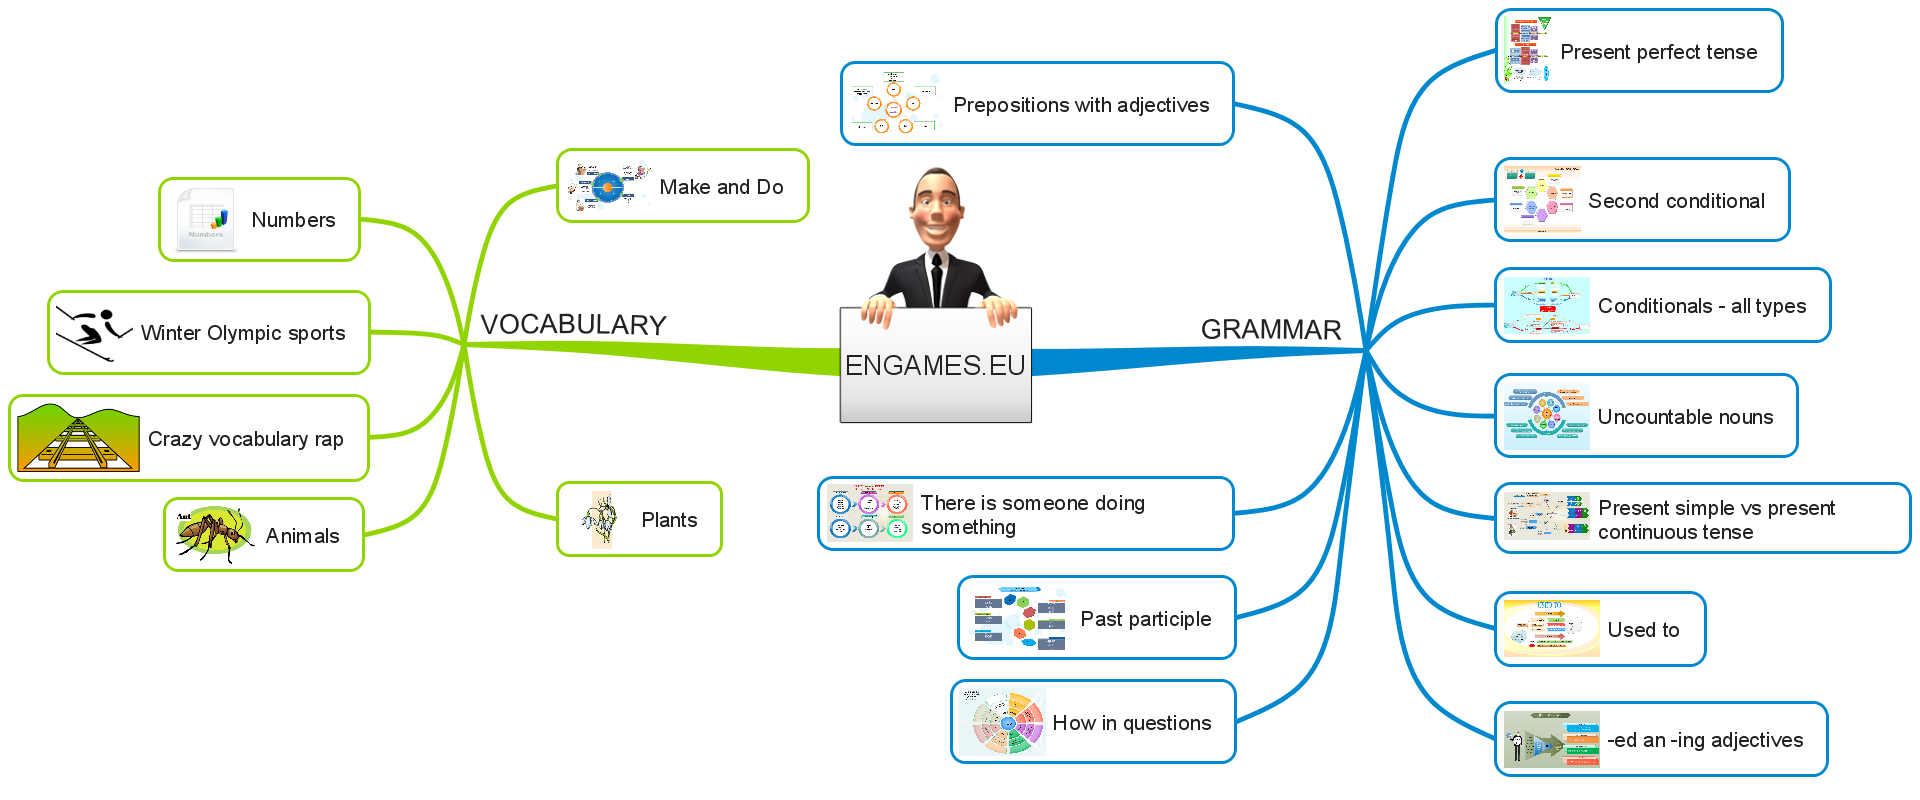 Engames eu site map all grammar and vocabulary posts